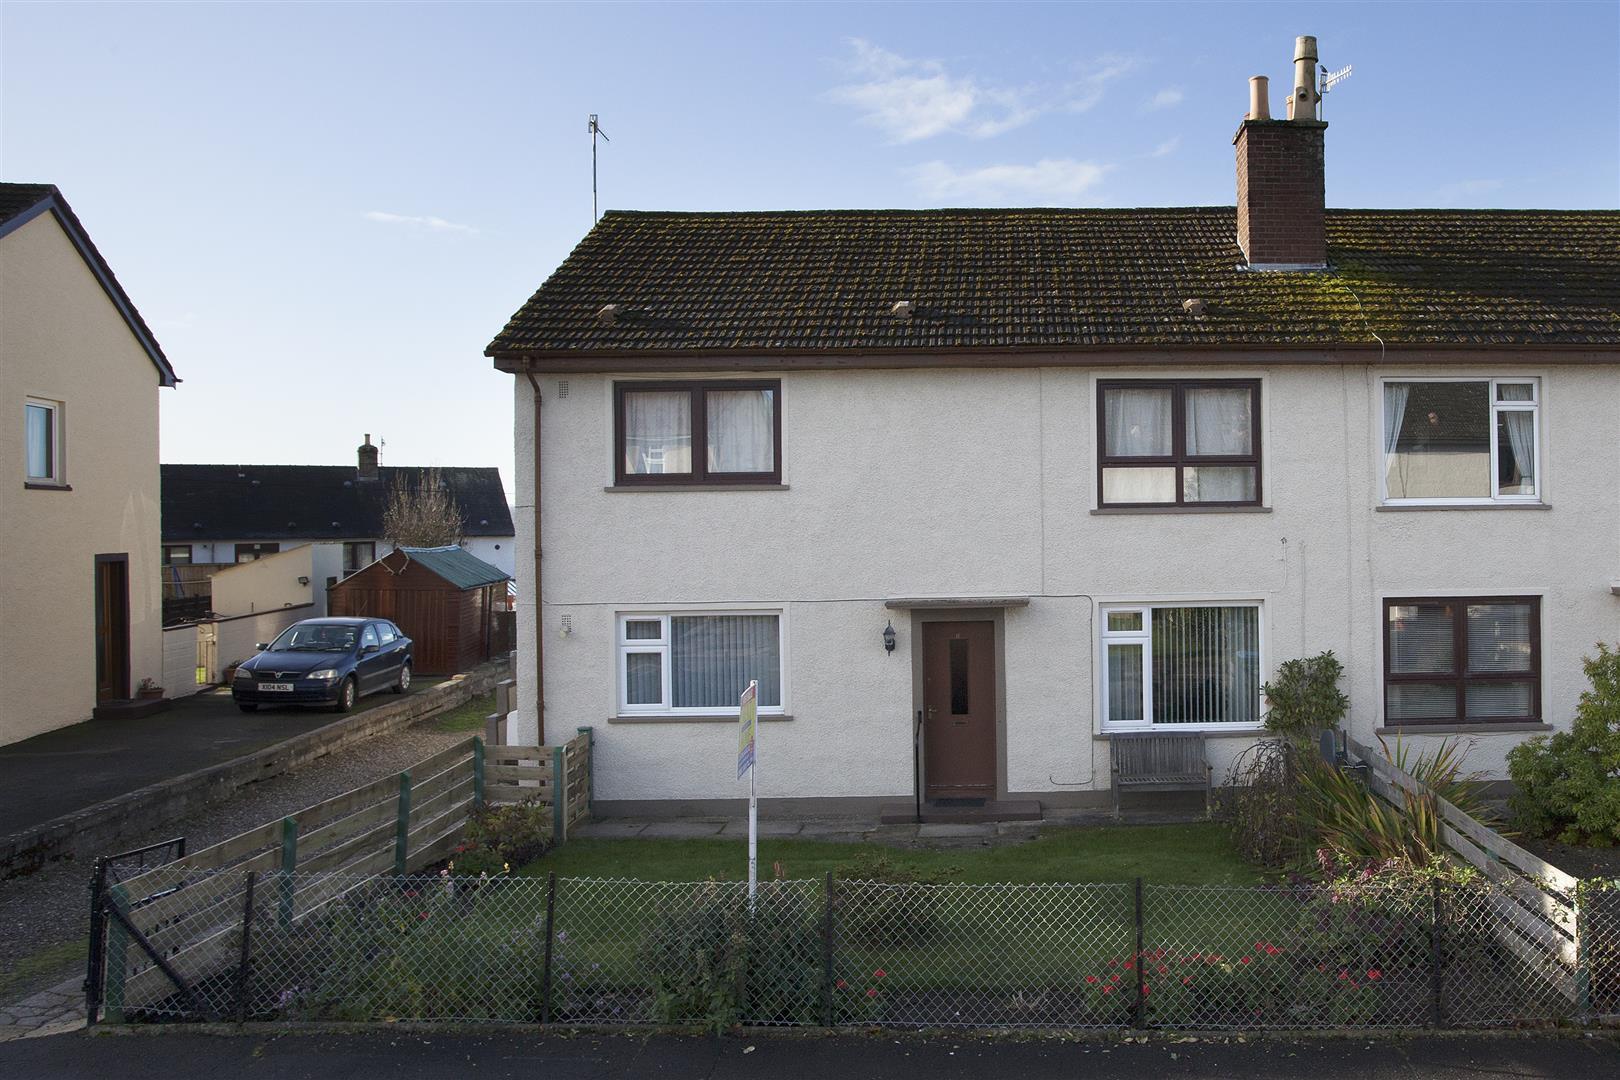 11, Douglas Road, Scone, Perthshire, PH2 6NF, UK